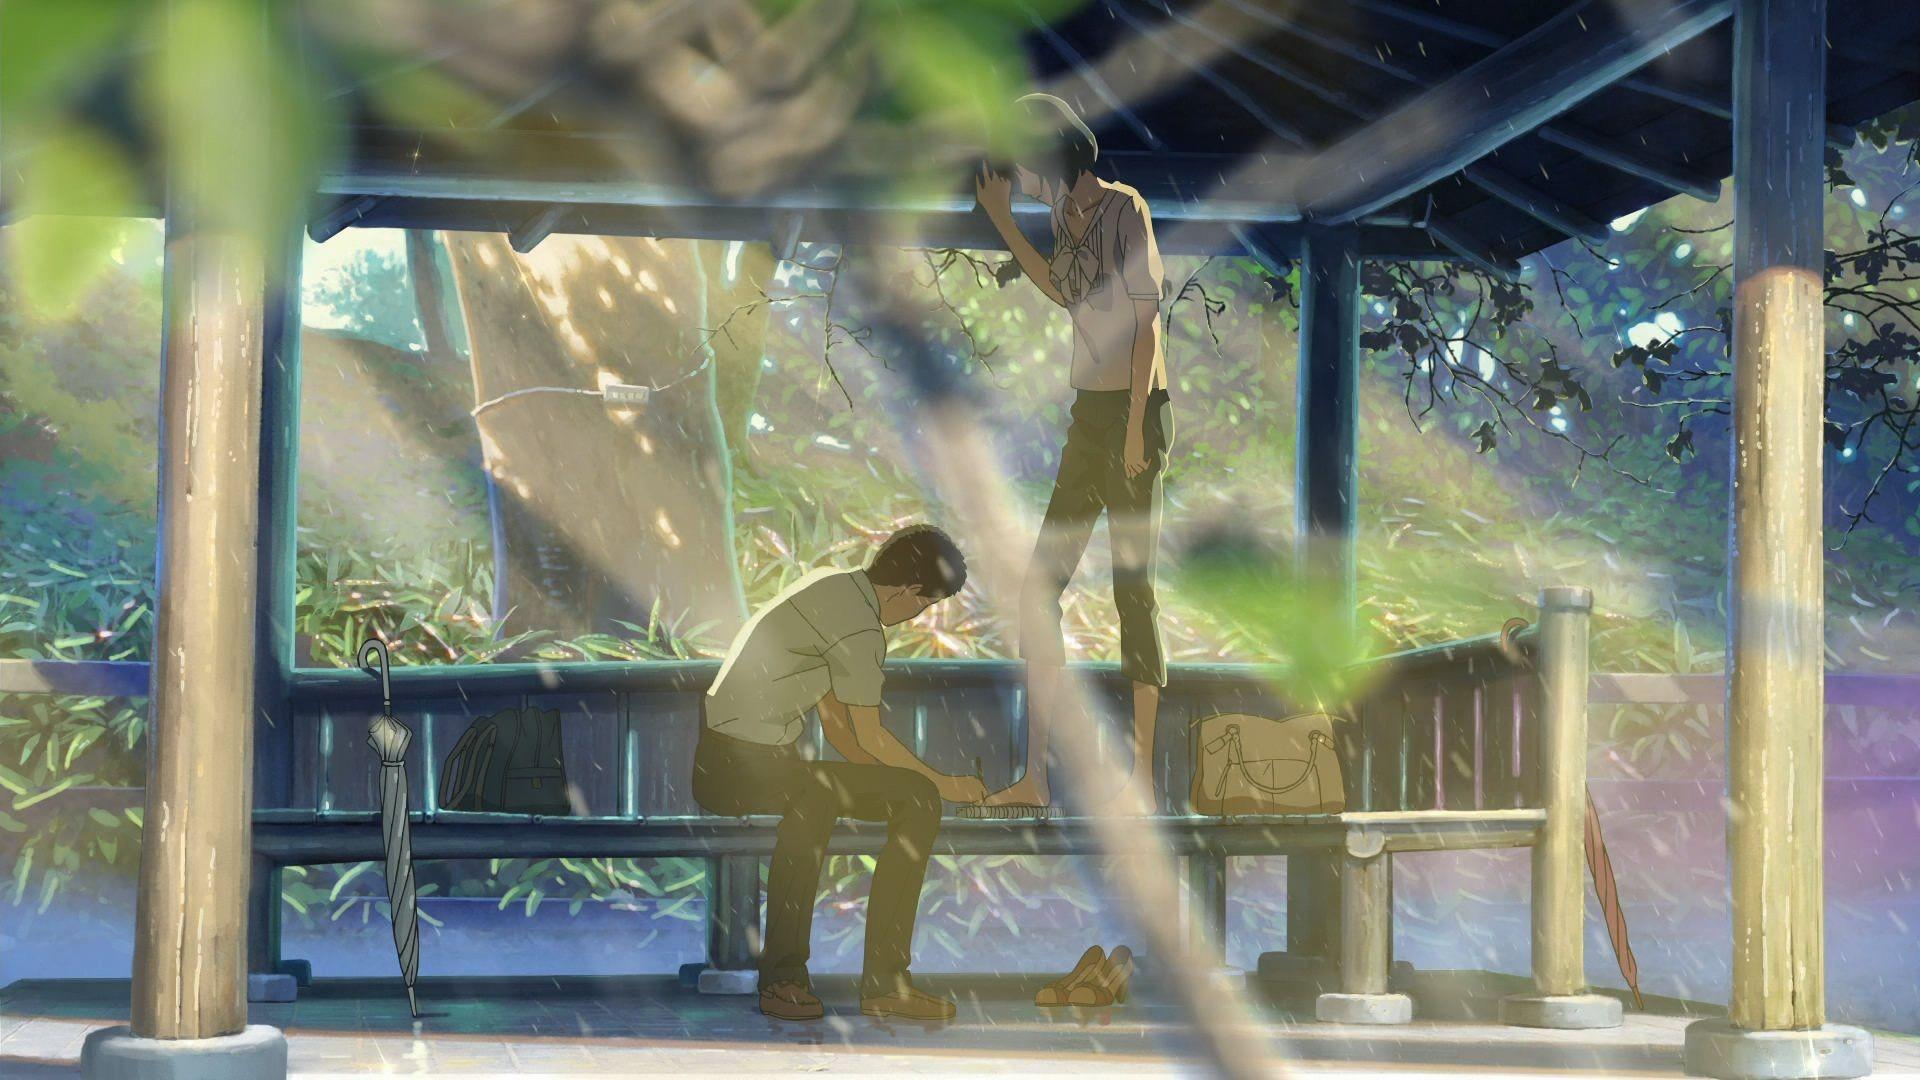 Koto no ha no Niwa Pemandangan anime, Studio ghibli